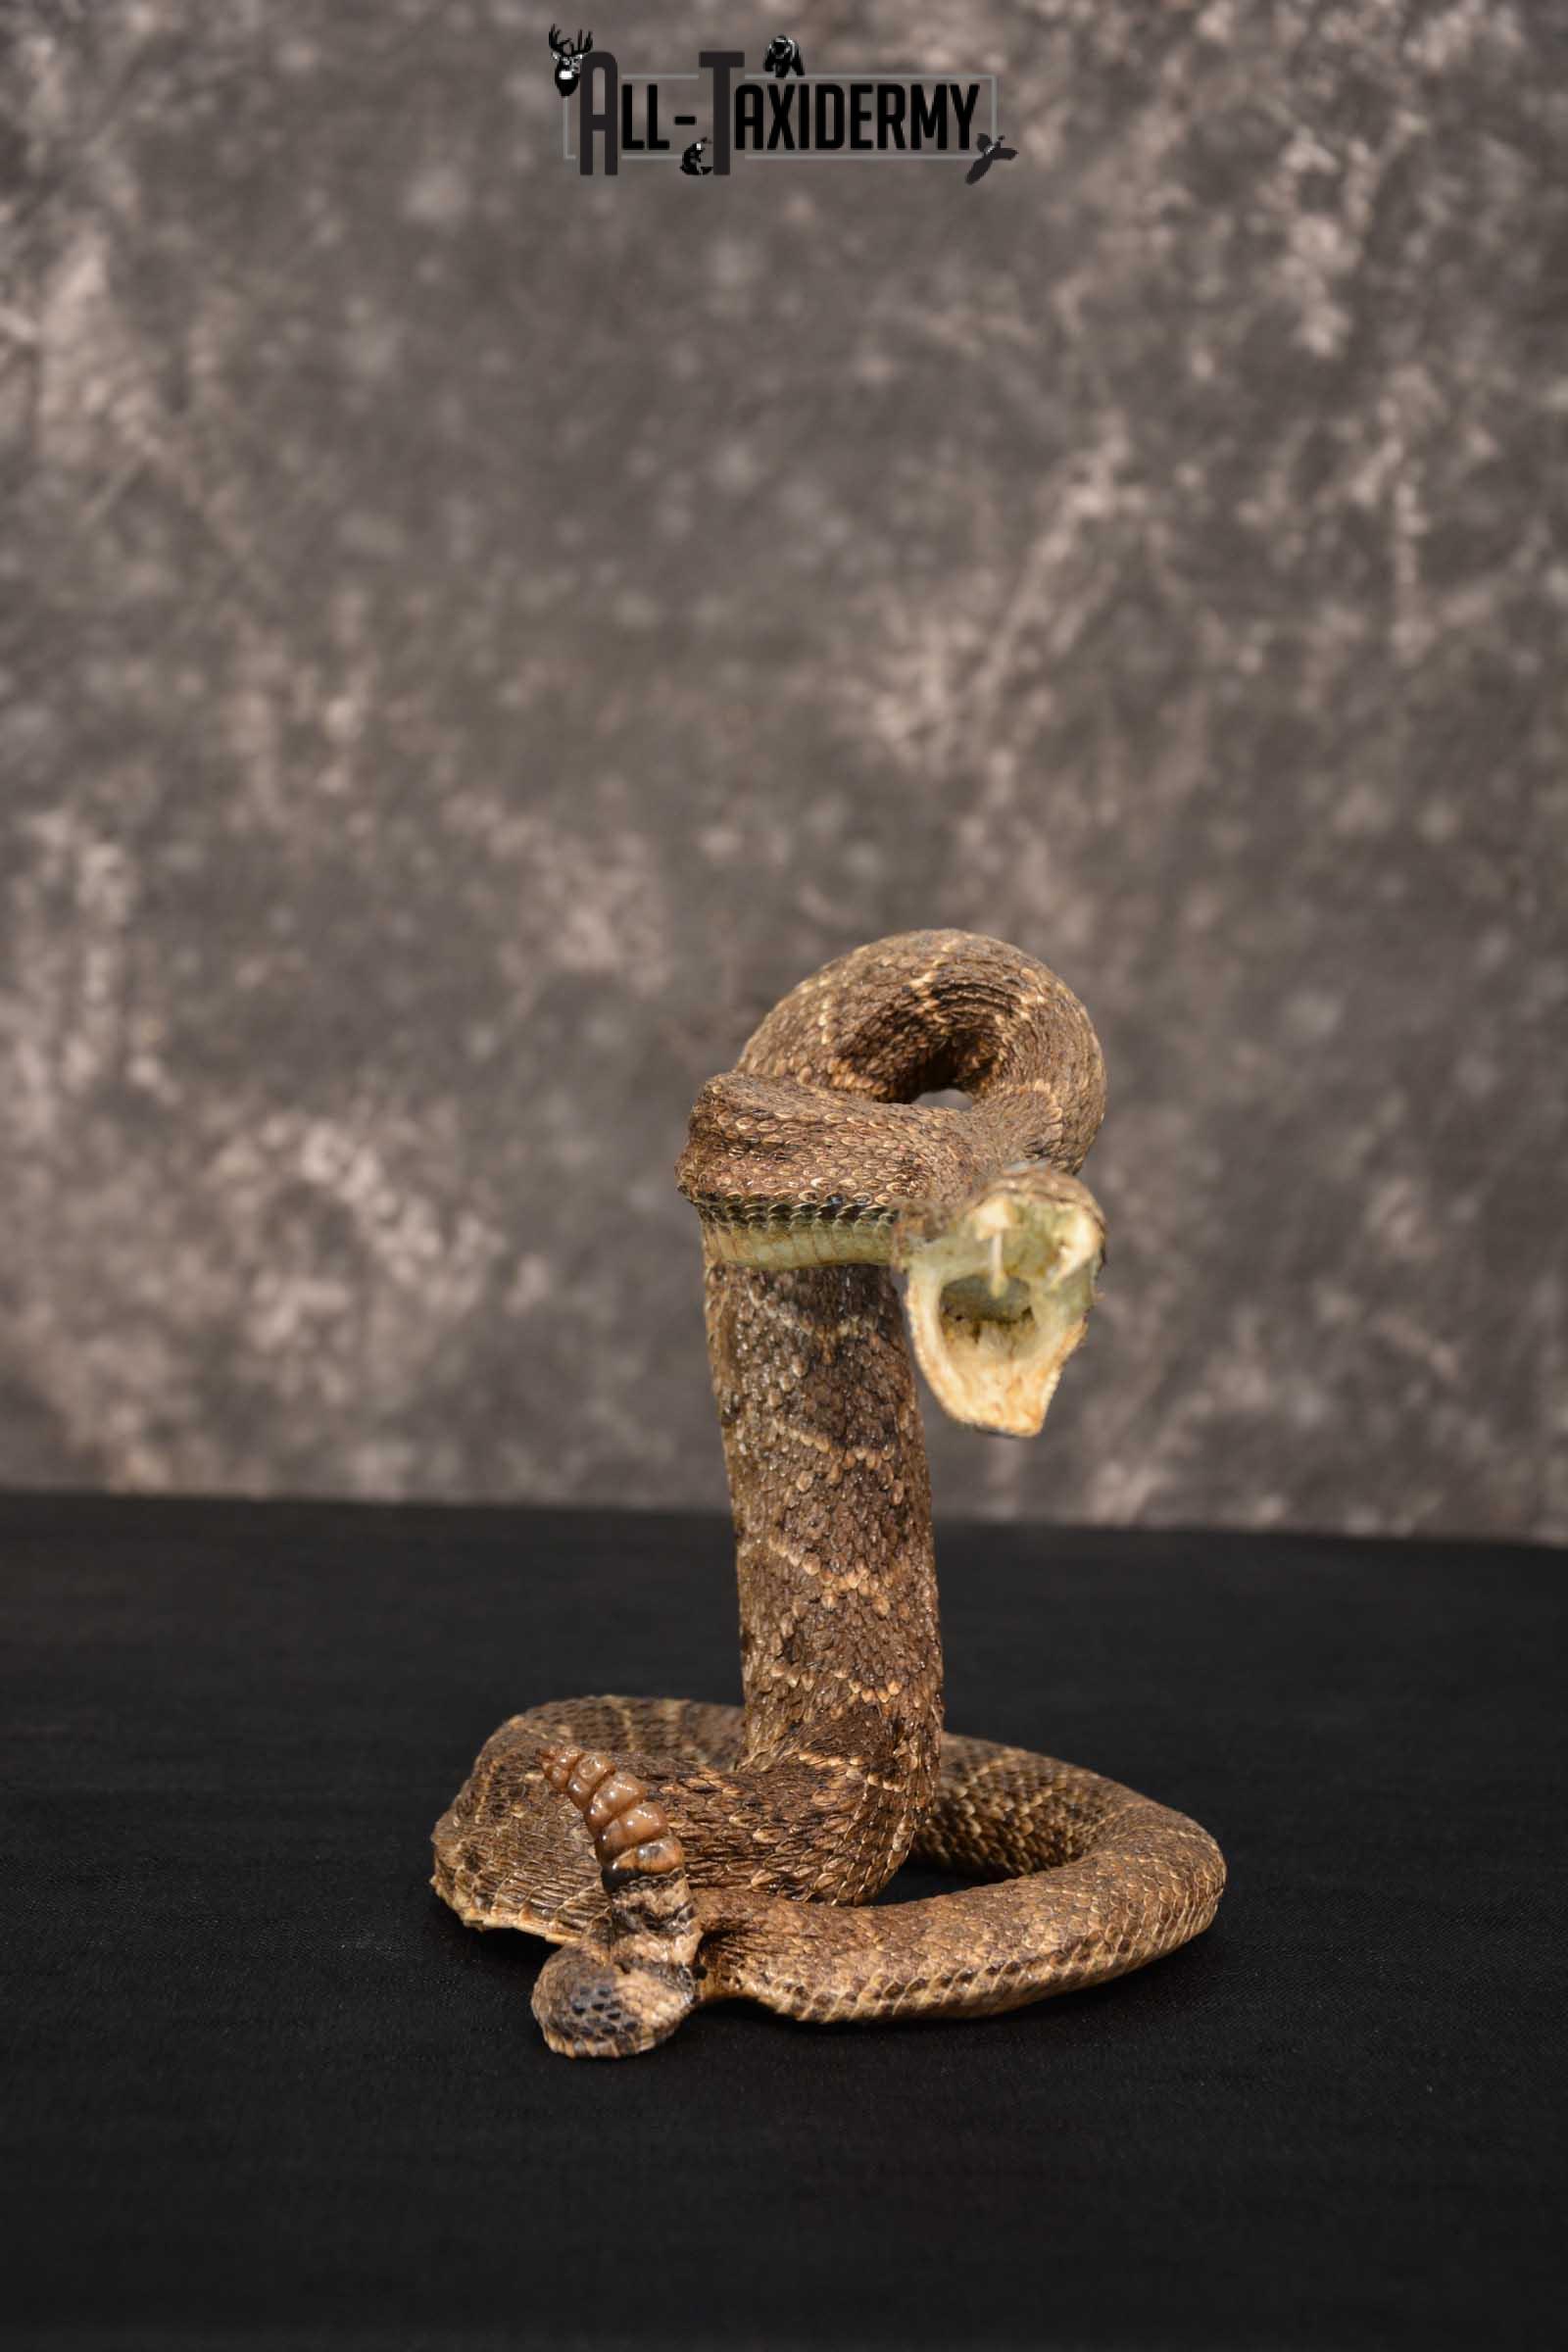 Diamondback Rattle Snake Taxidermy mount for sale SKU 1744